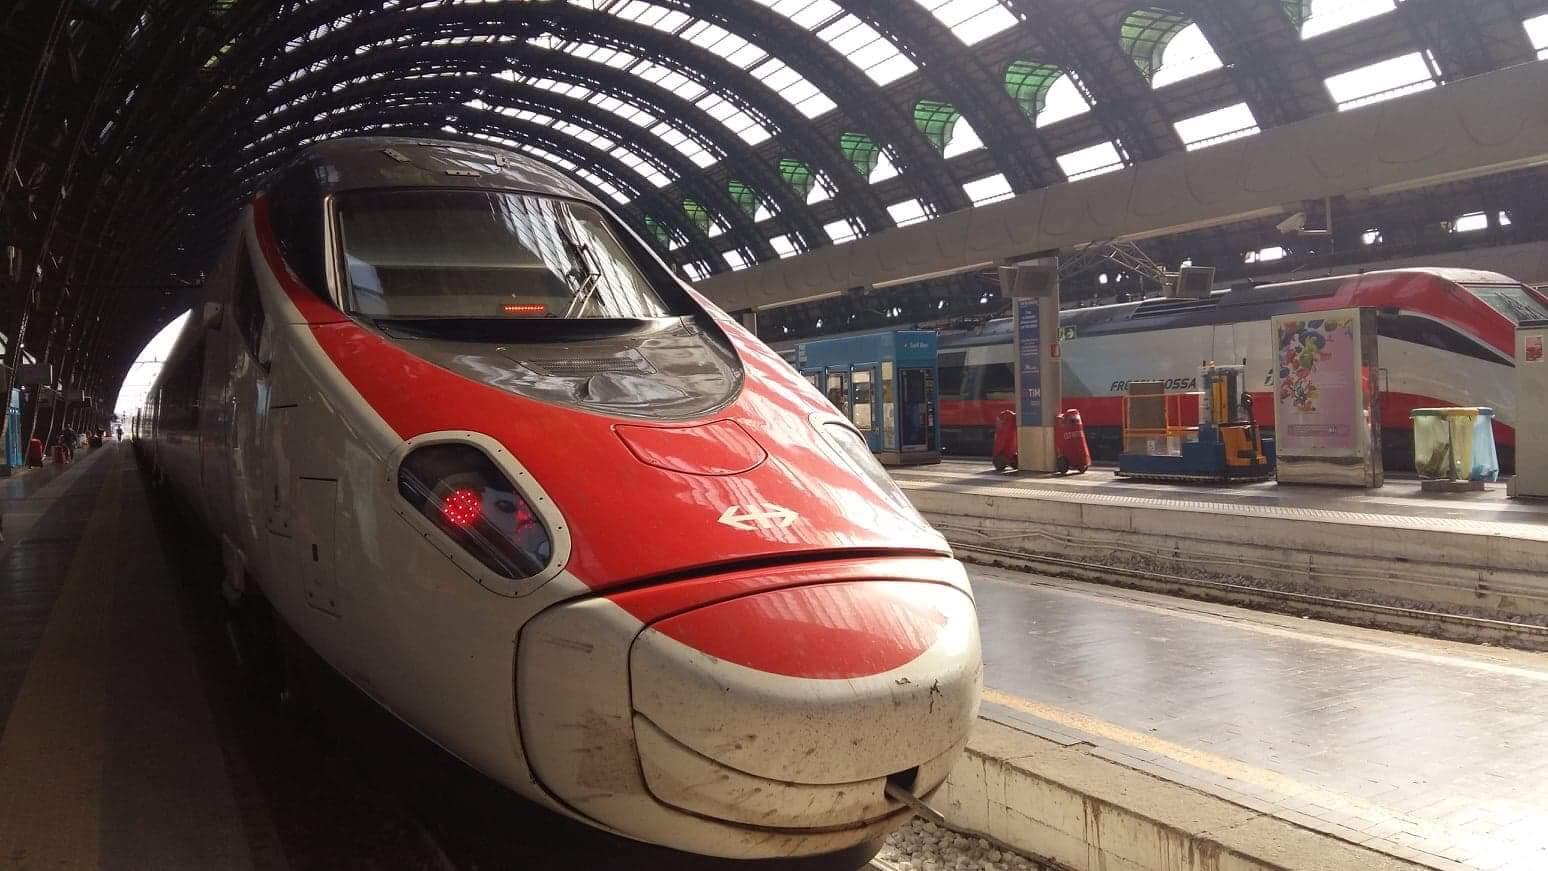 SBB ETR 610 Swiss Train